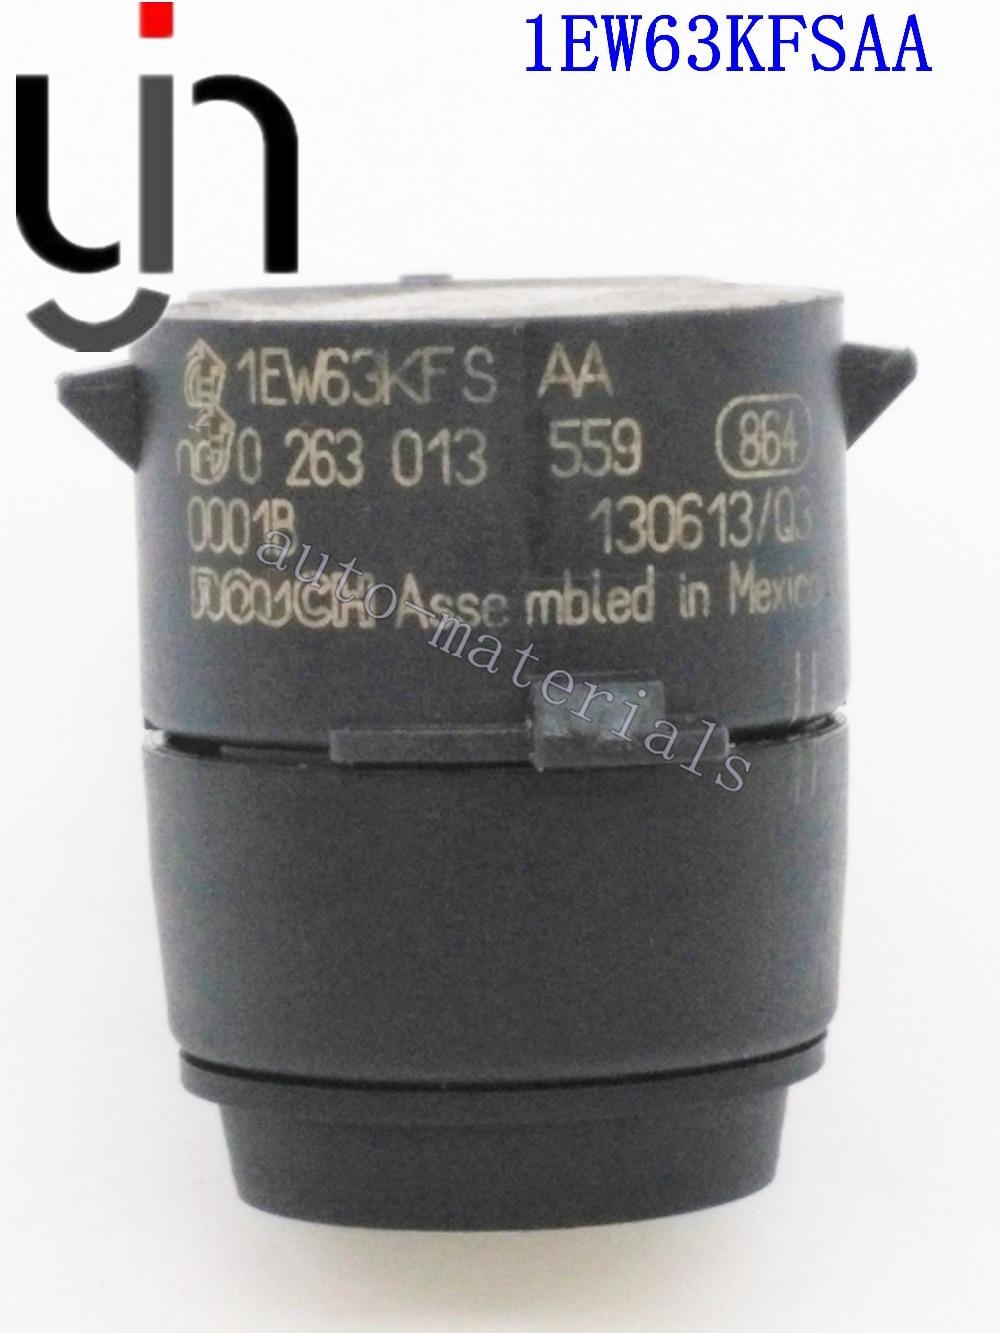 1pcs car Bumper Object Sensor Radar Parking Sensor for CHRYSLER Jeep Grand Cherokee 1EW63KEPAA 1EW63KFSAA 1EW63KGZAA 1EW63KL4AA